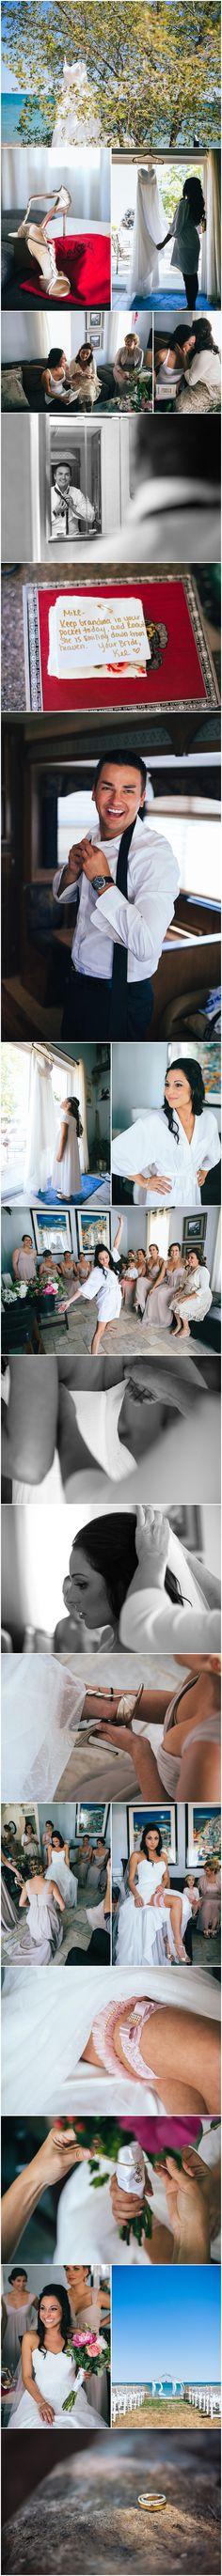 Kelli + Mike's Wedding Day